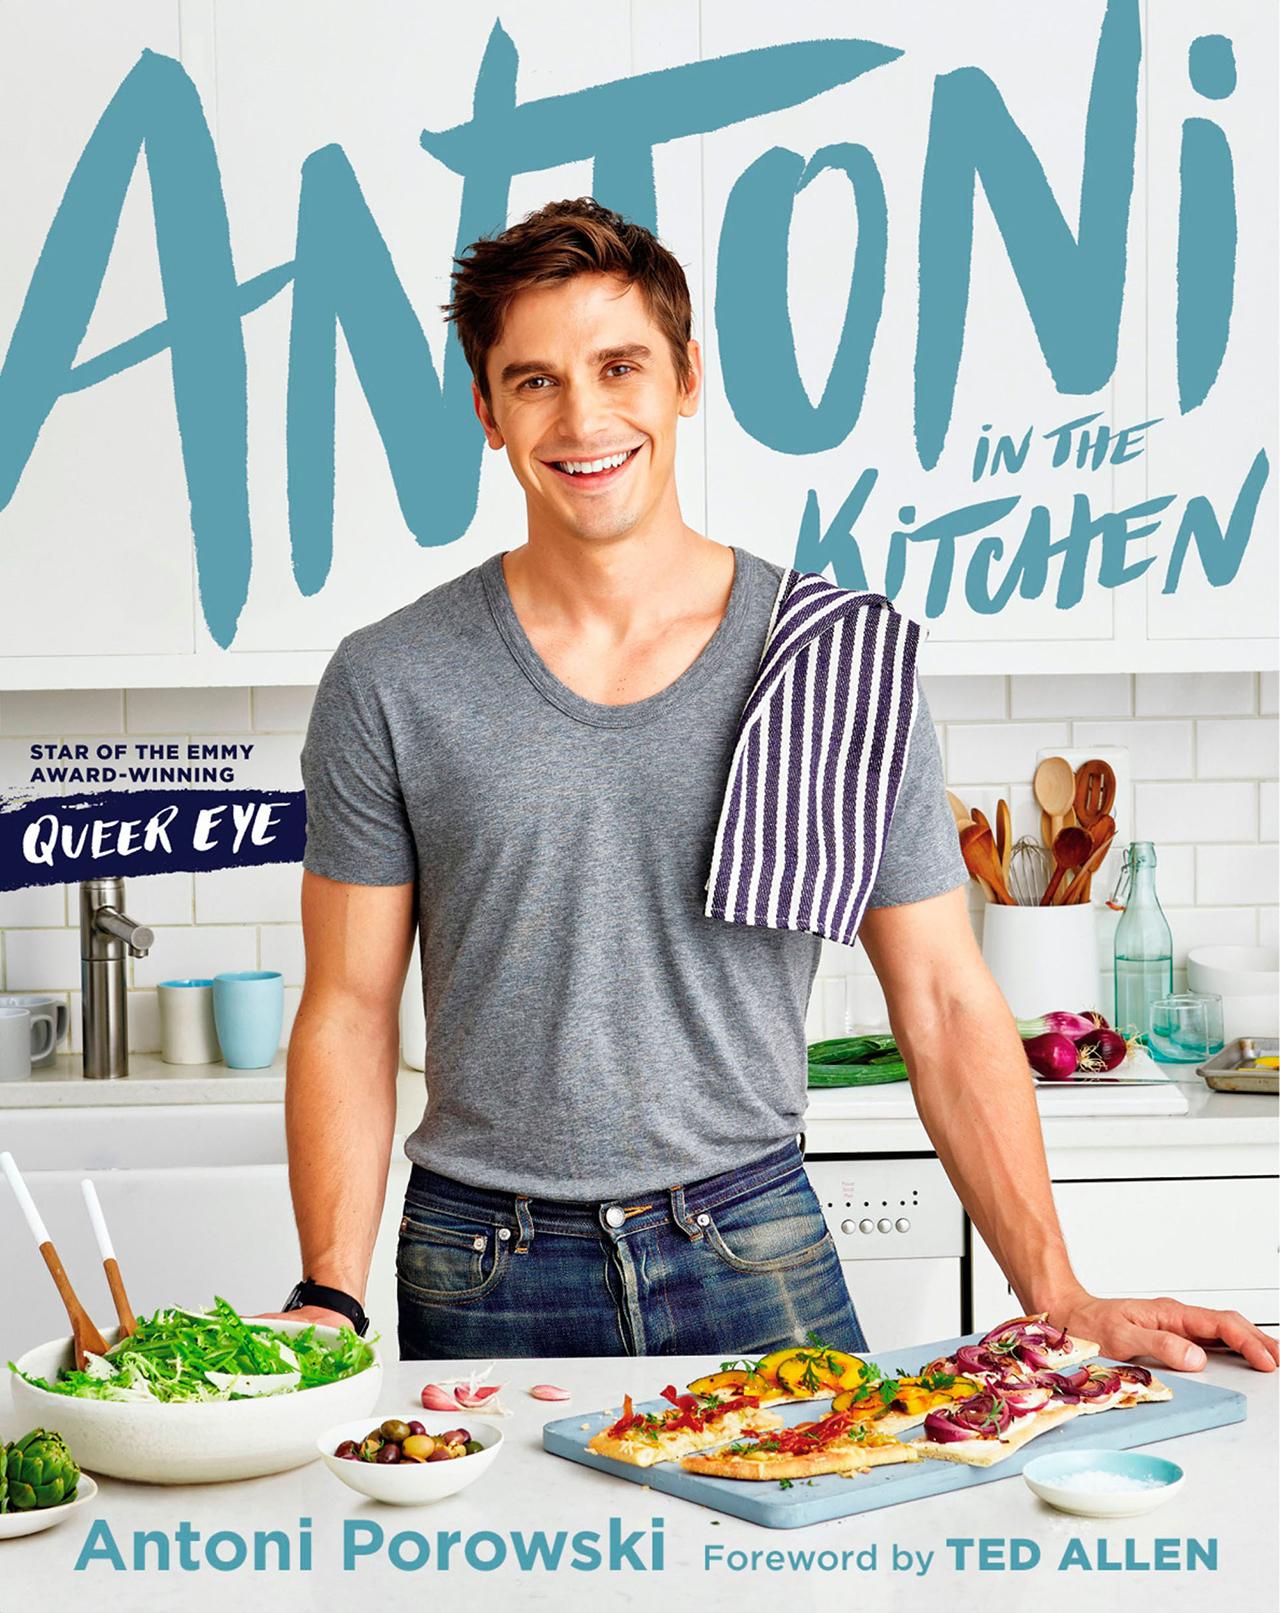 antoni in the kitchen cookbook cover